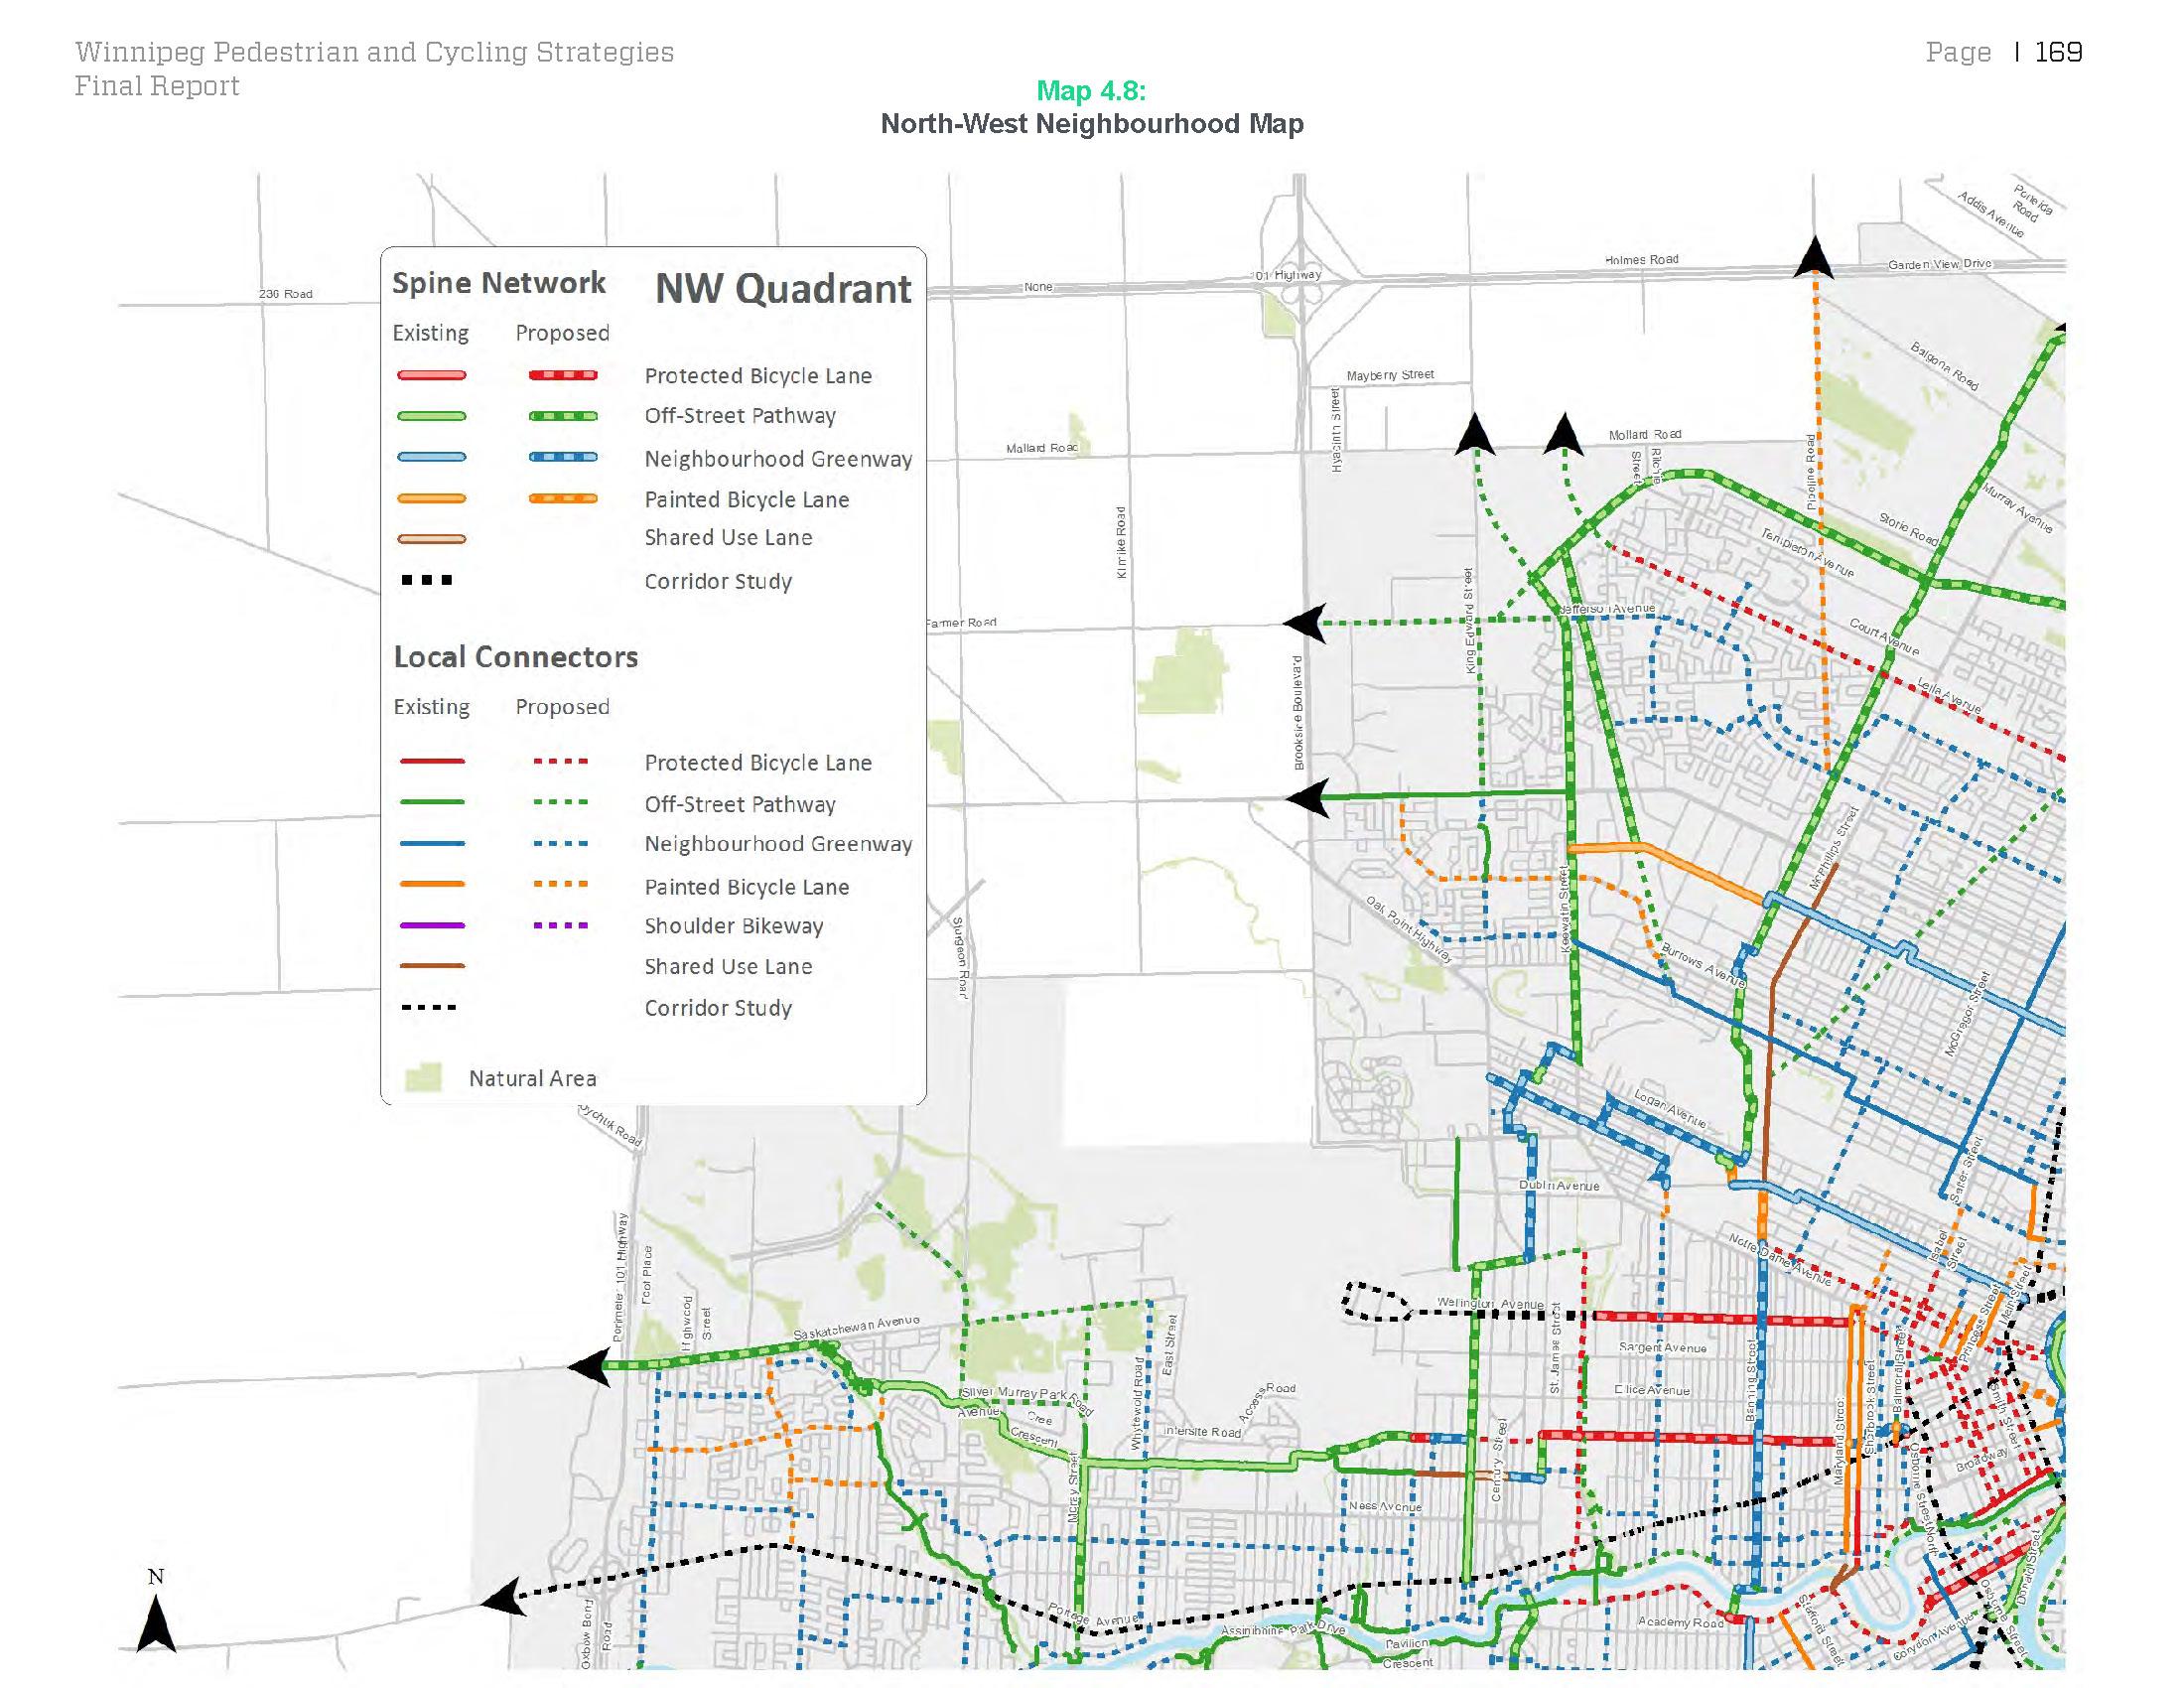 Winnipeg Pedestrian and Cycling Strategies Alta Planning Design